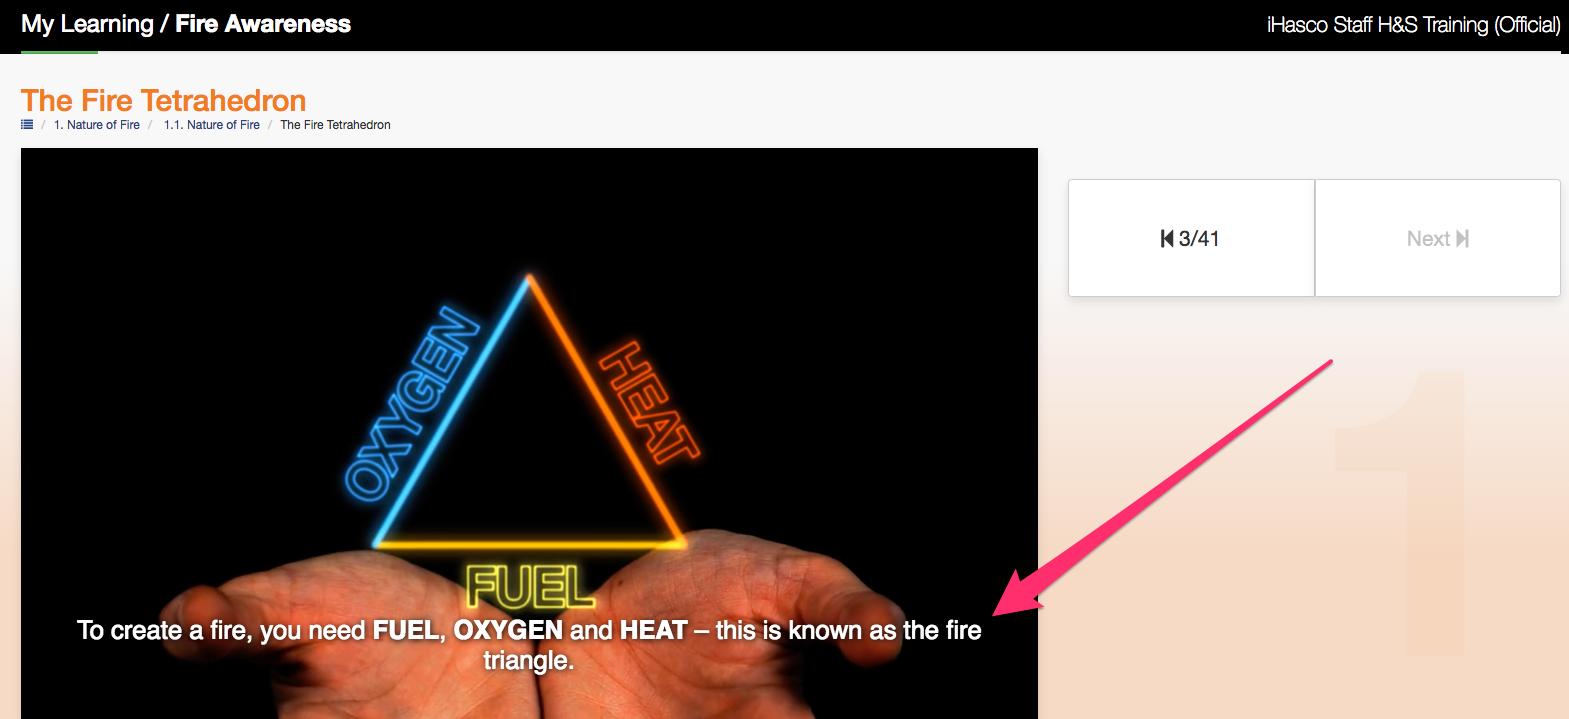 Subtitles on Fire Awareness Training